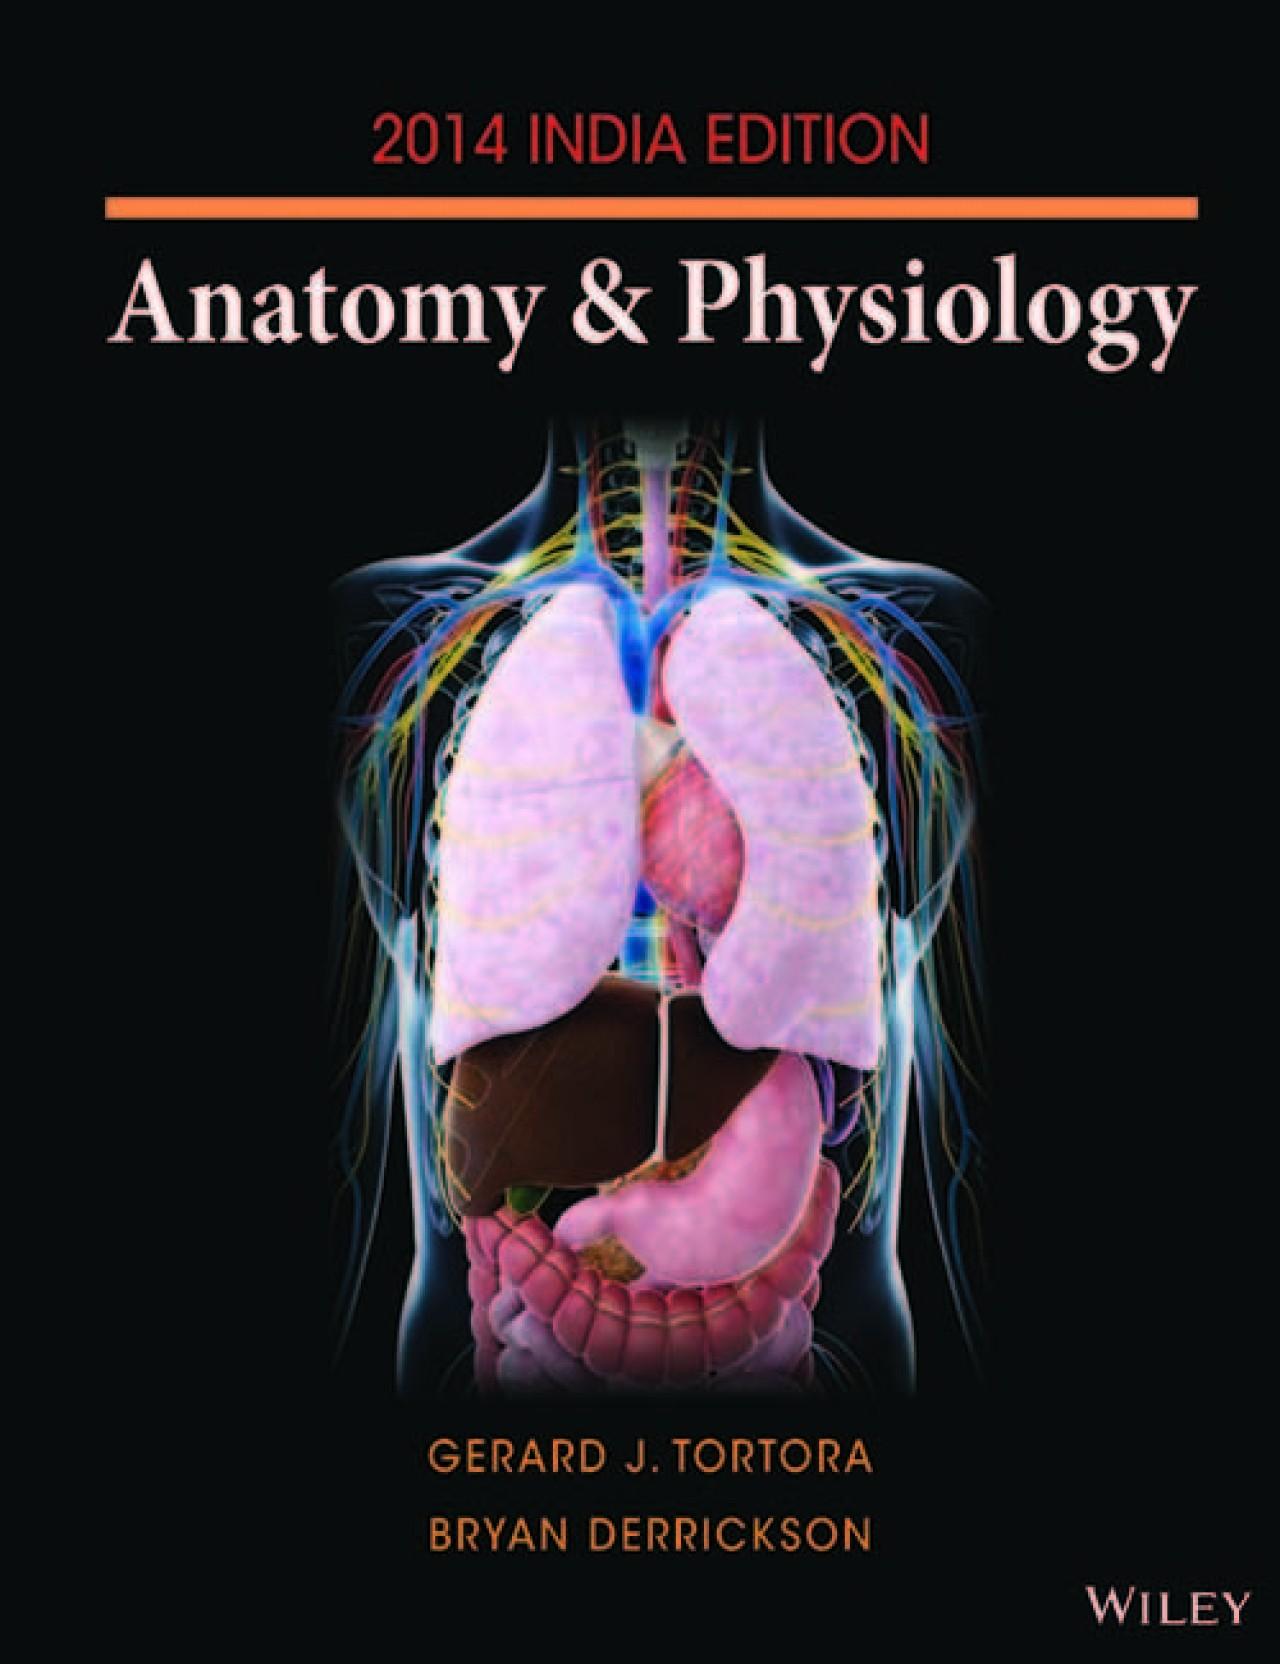 Anatomy & Physiology - 2014 1st Edition: Buy Anatomy & Physiology ...